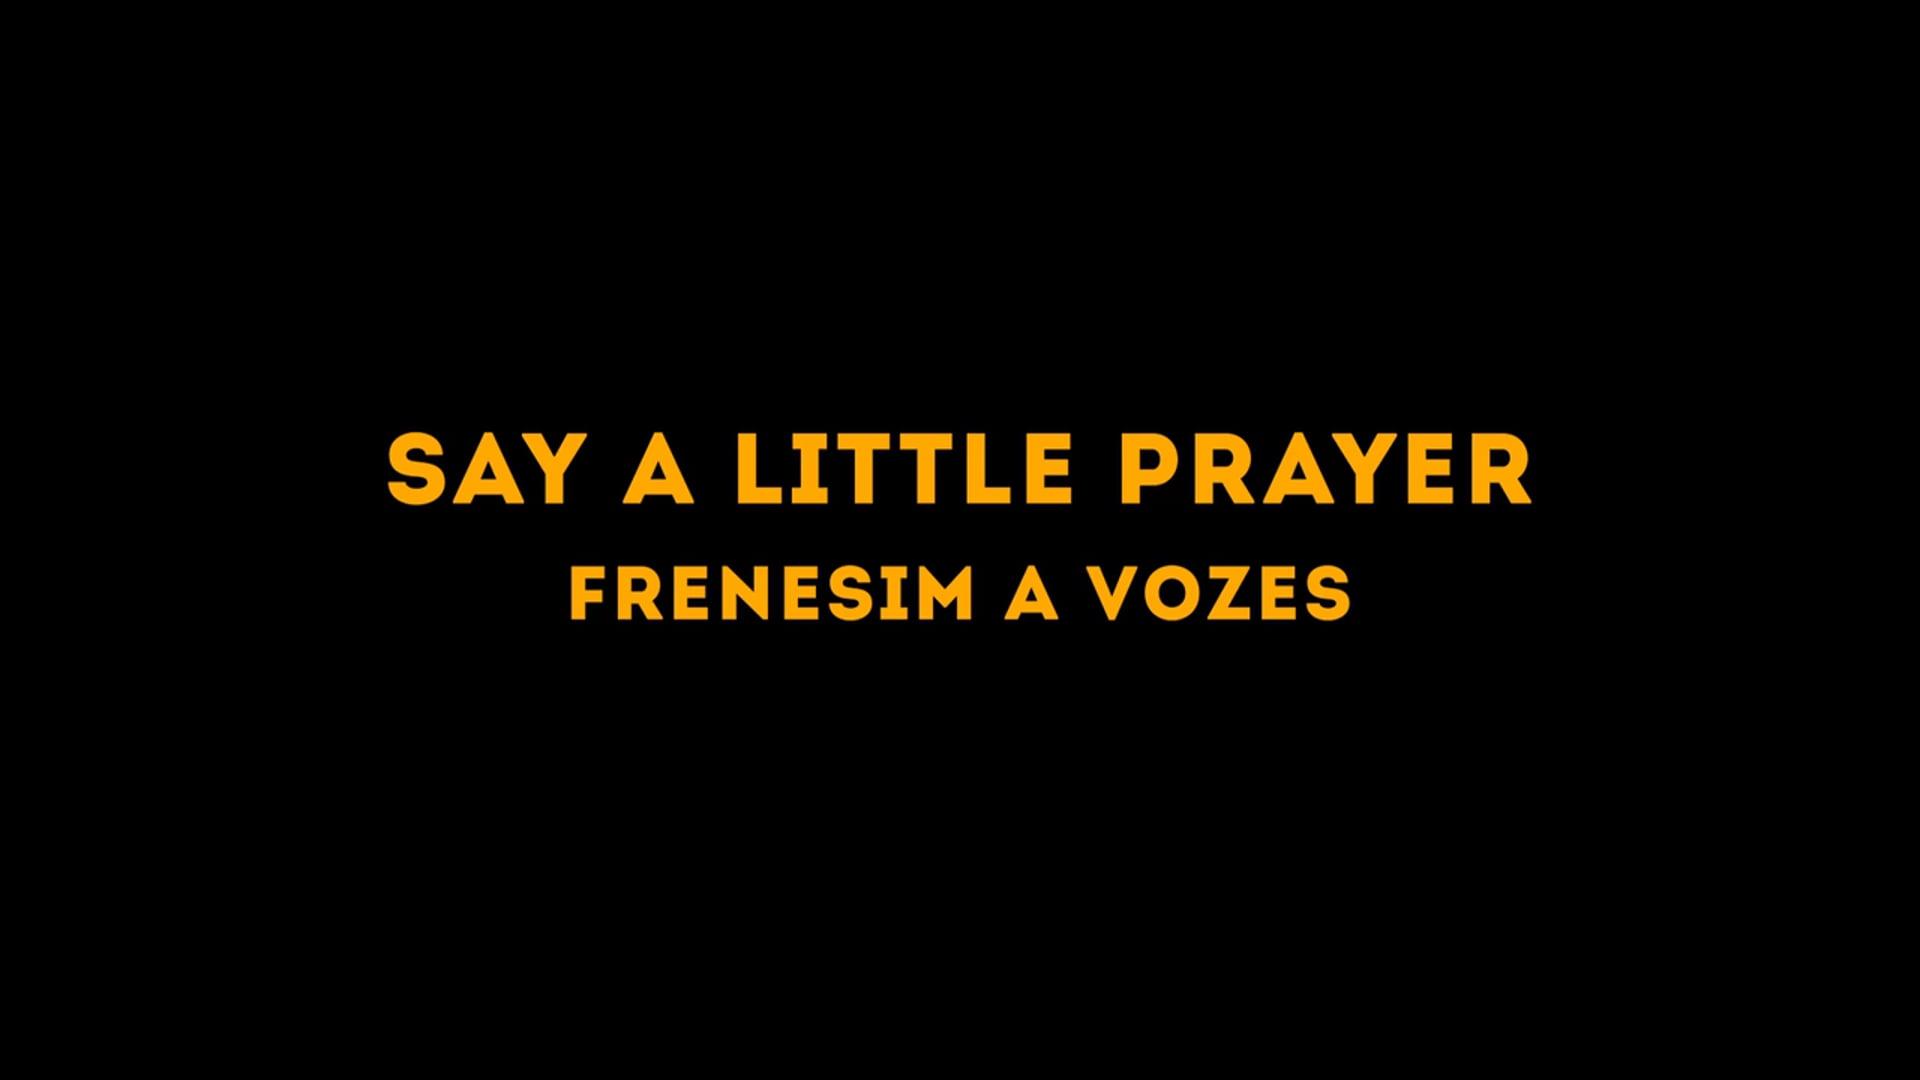 [Frenesim a Vozes] Say a Little Prayer